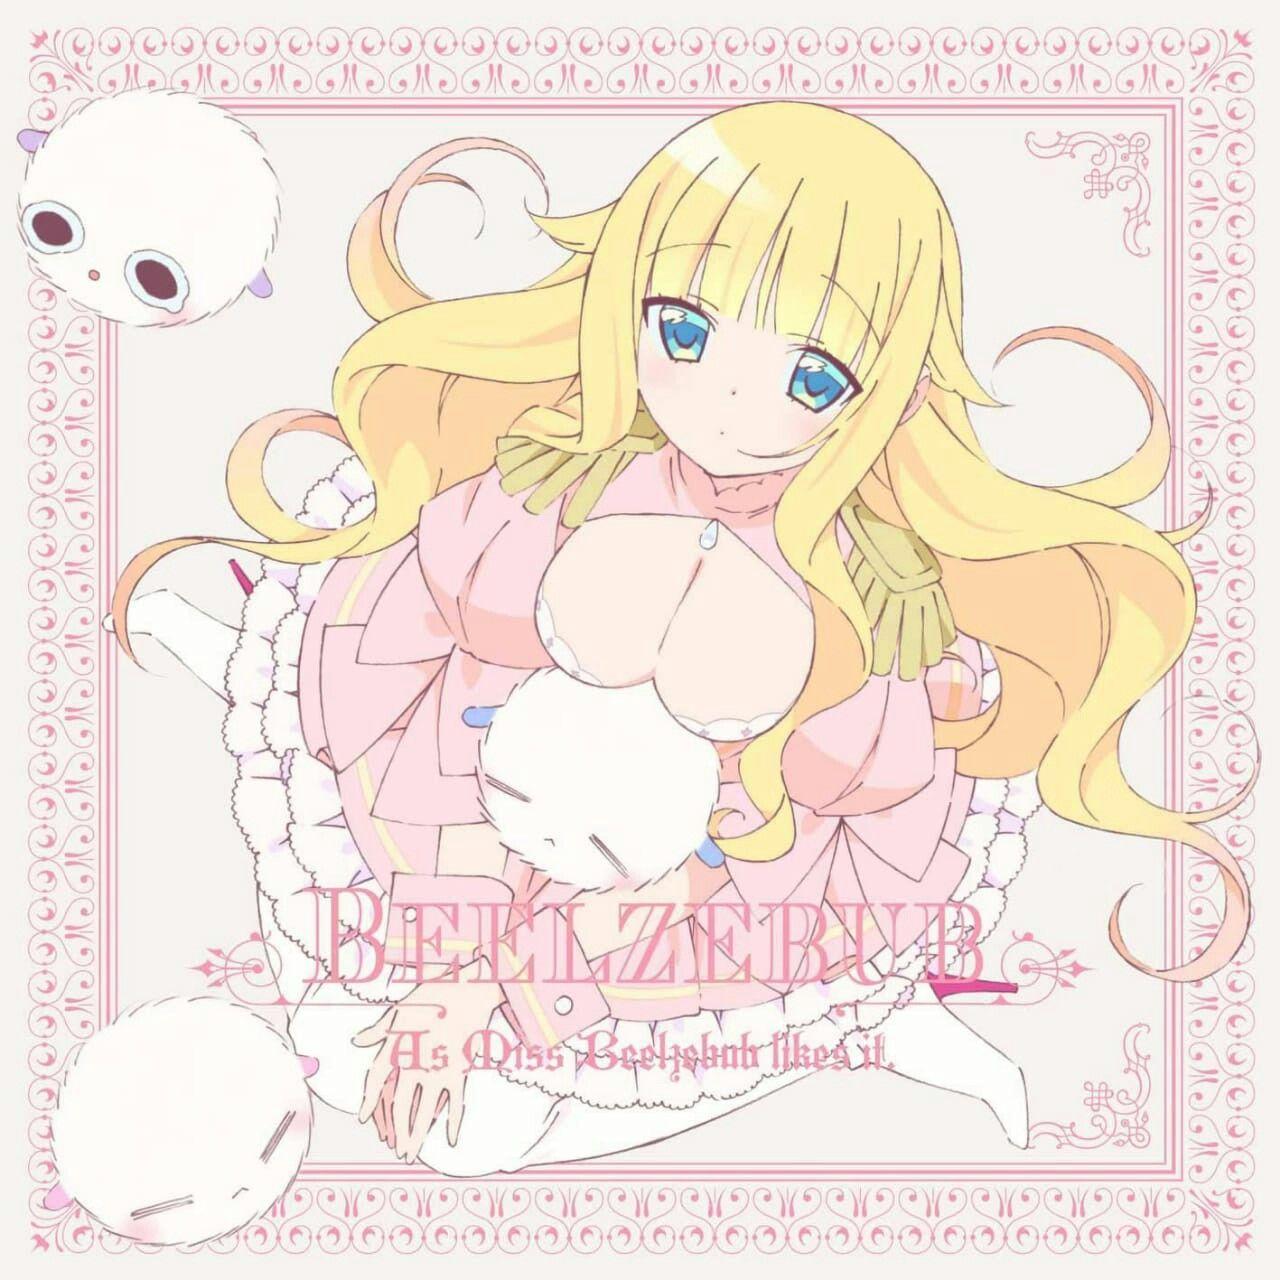 Image by Paulina Podlewska on Anime